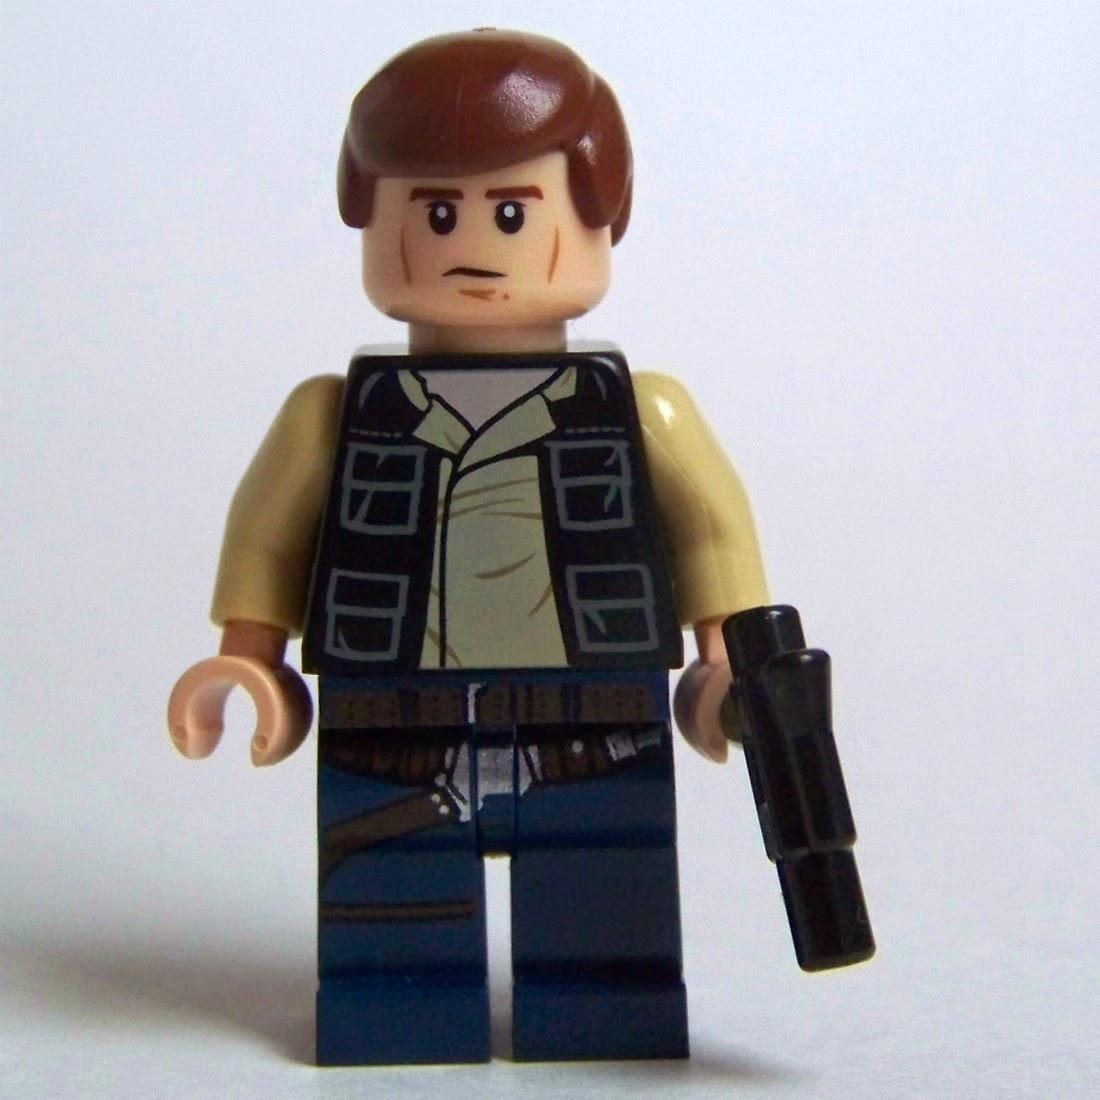 LEGO Han Solo minifigure 2014